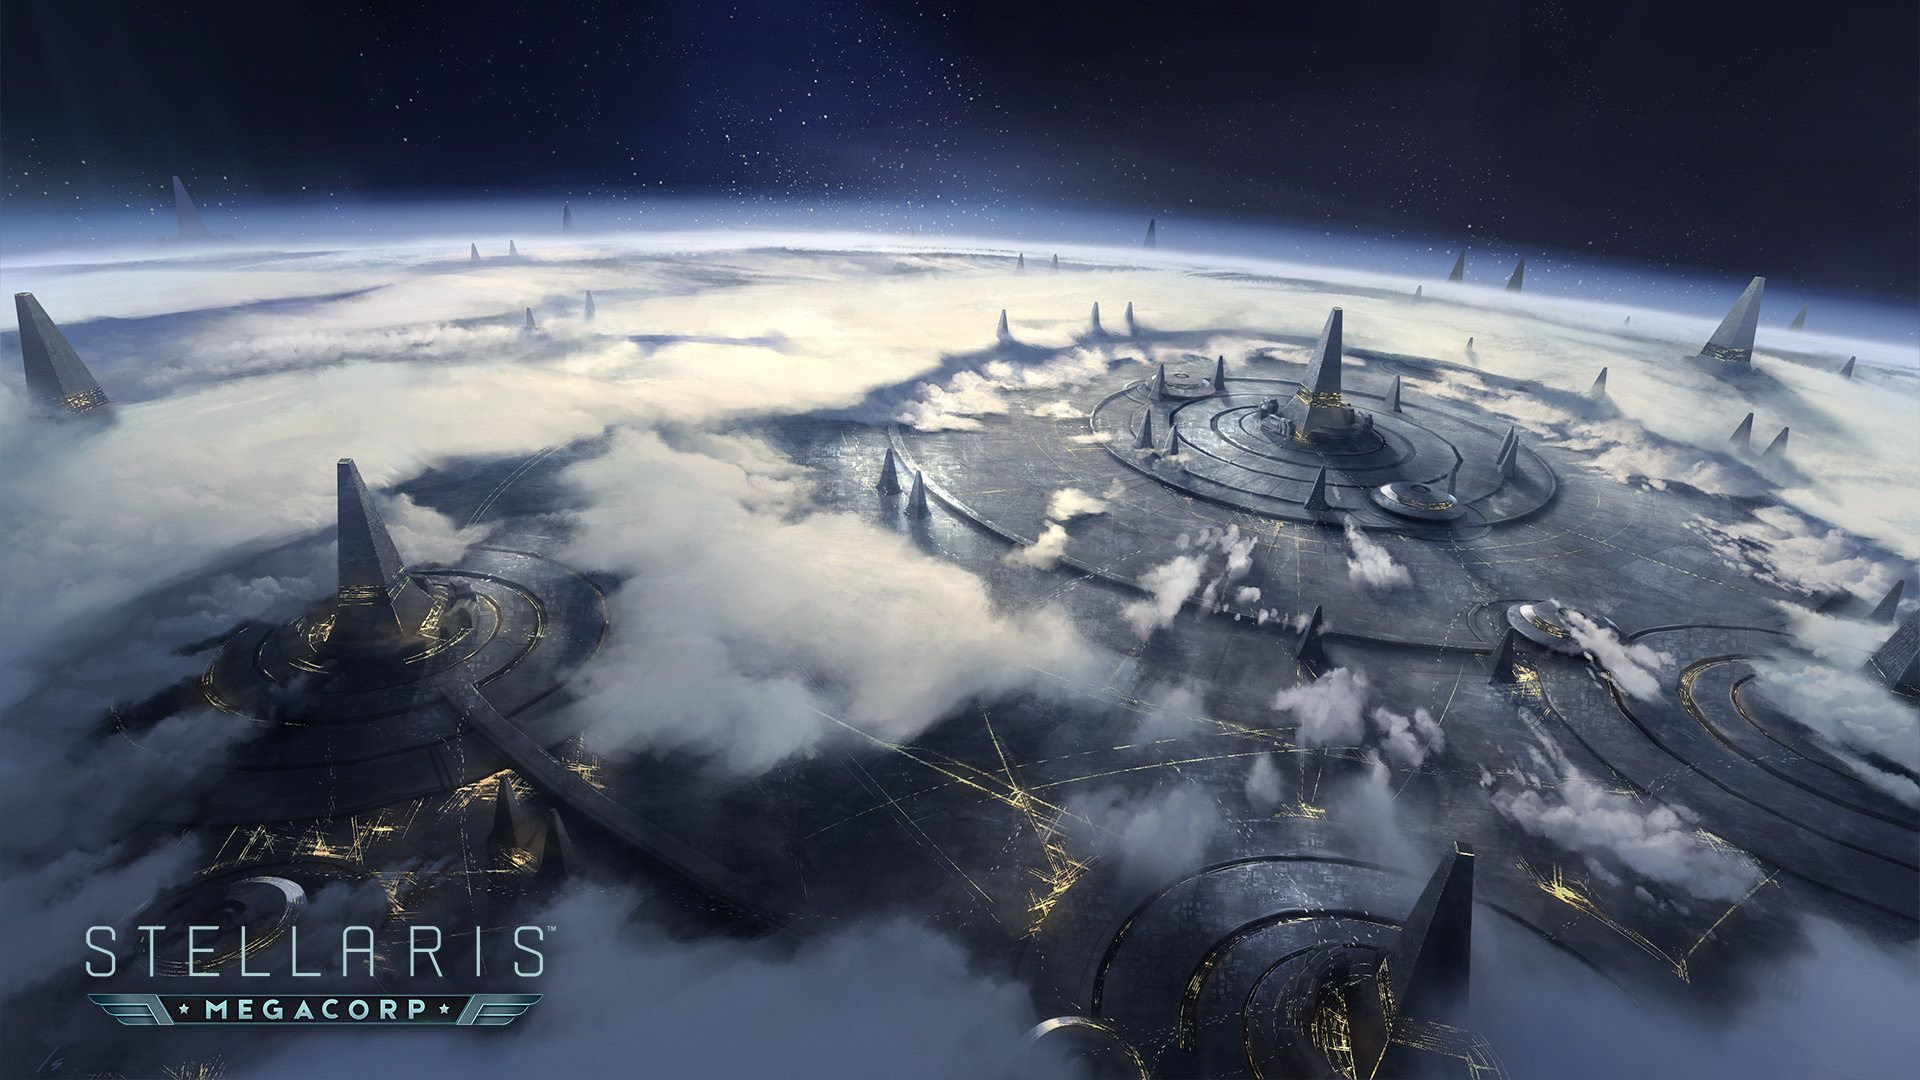 Image result for stellaris artwork megacorp | New Vegas II | Game